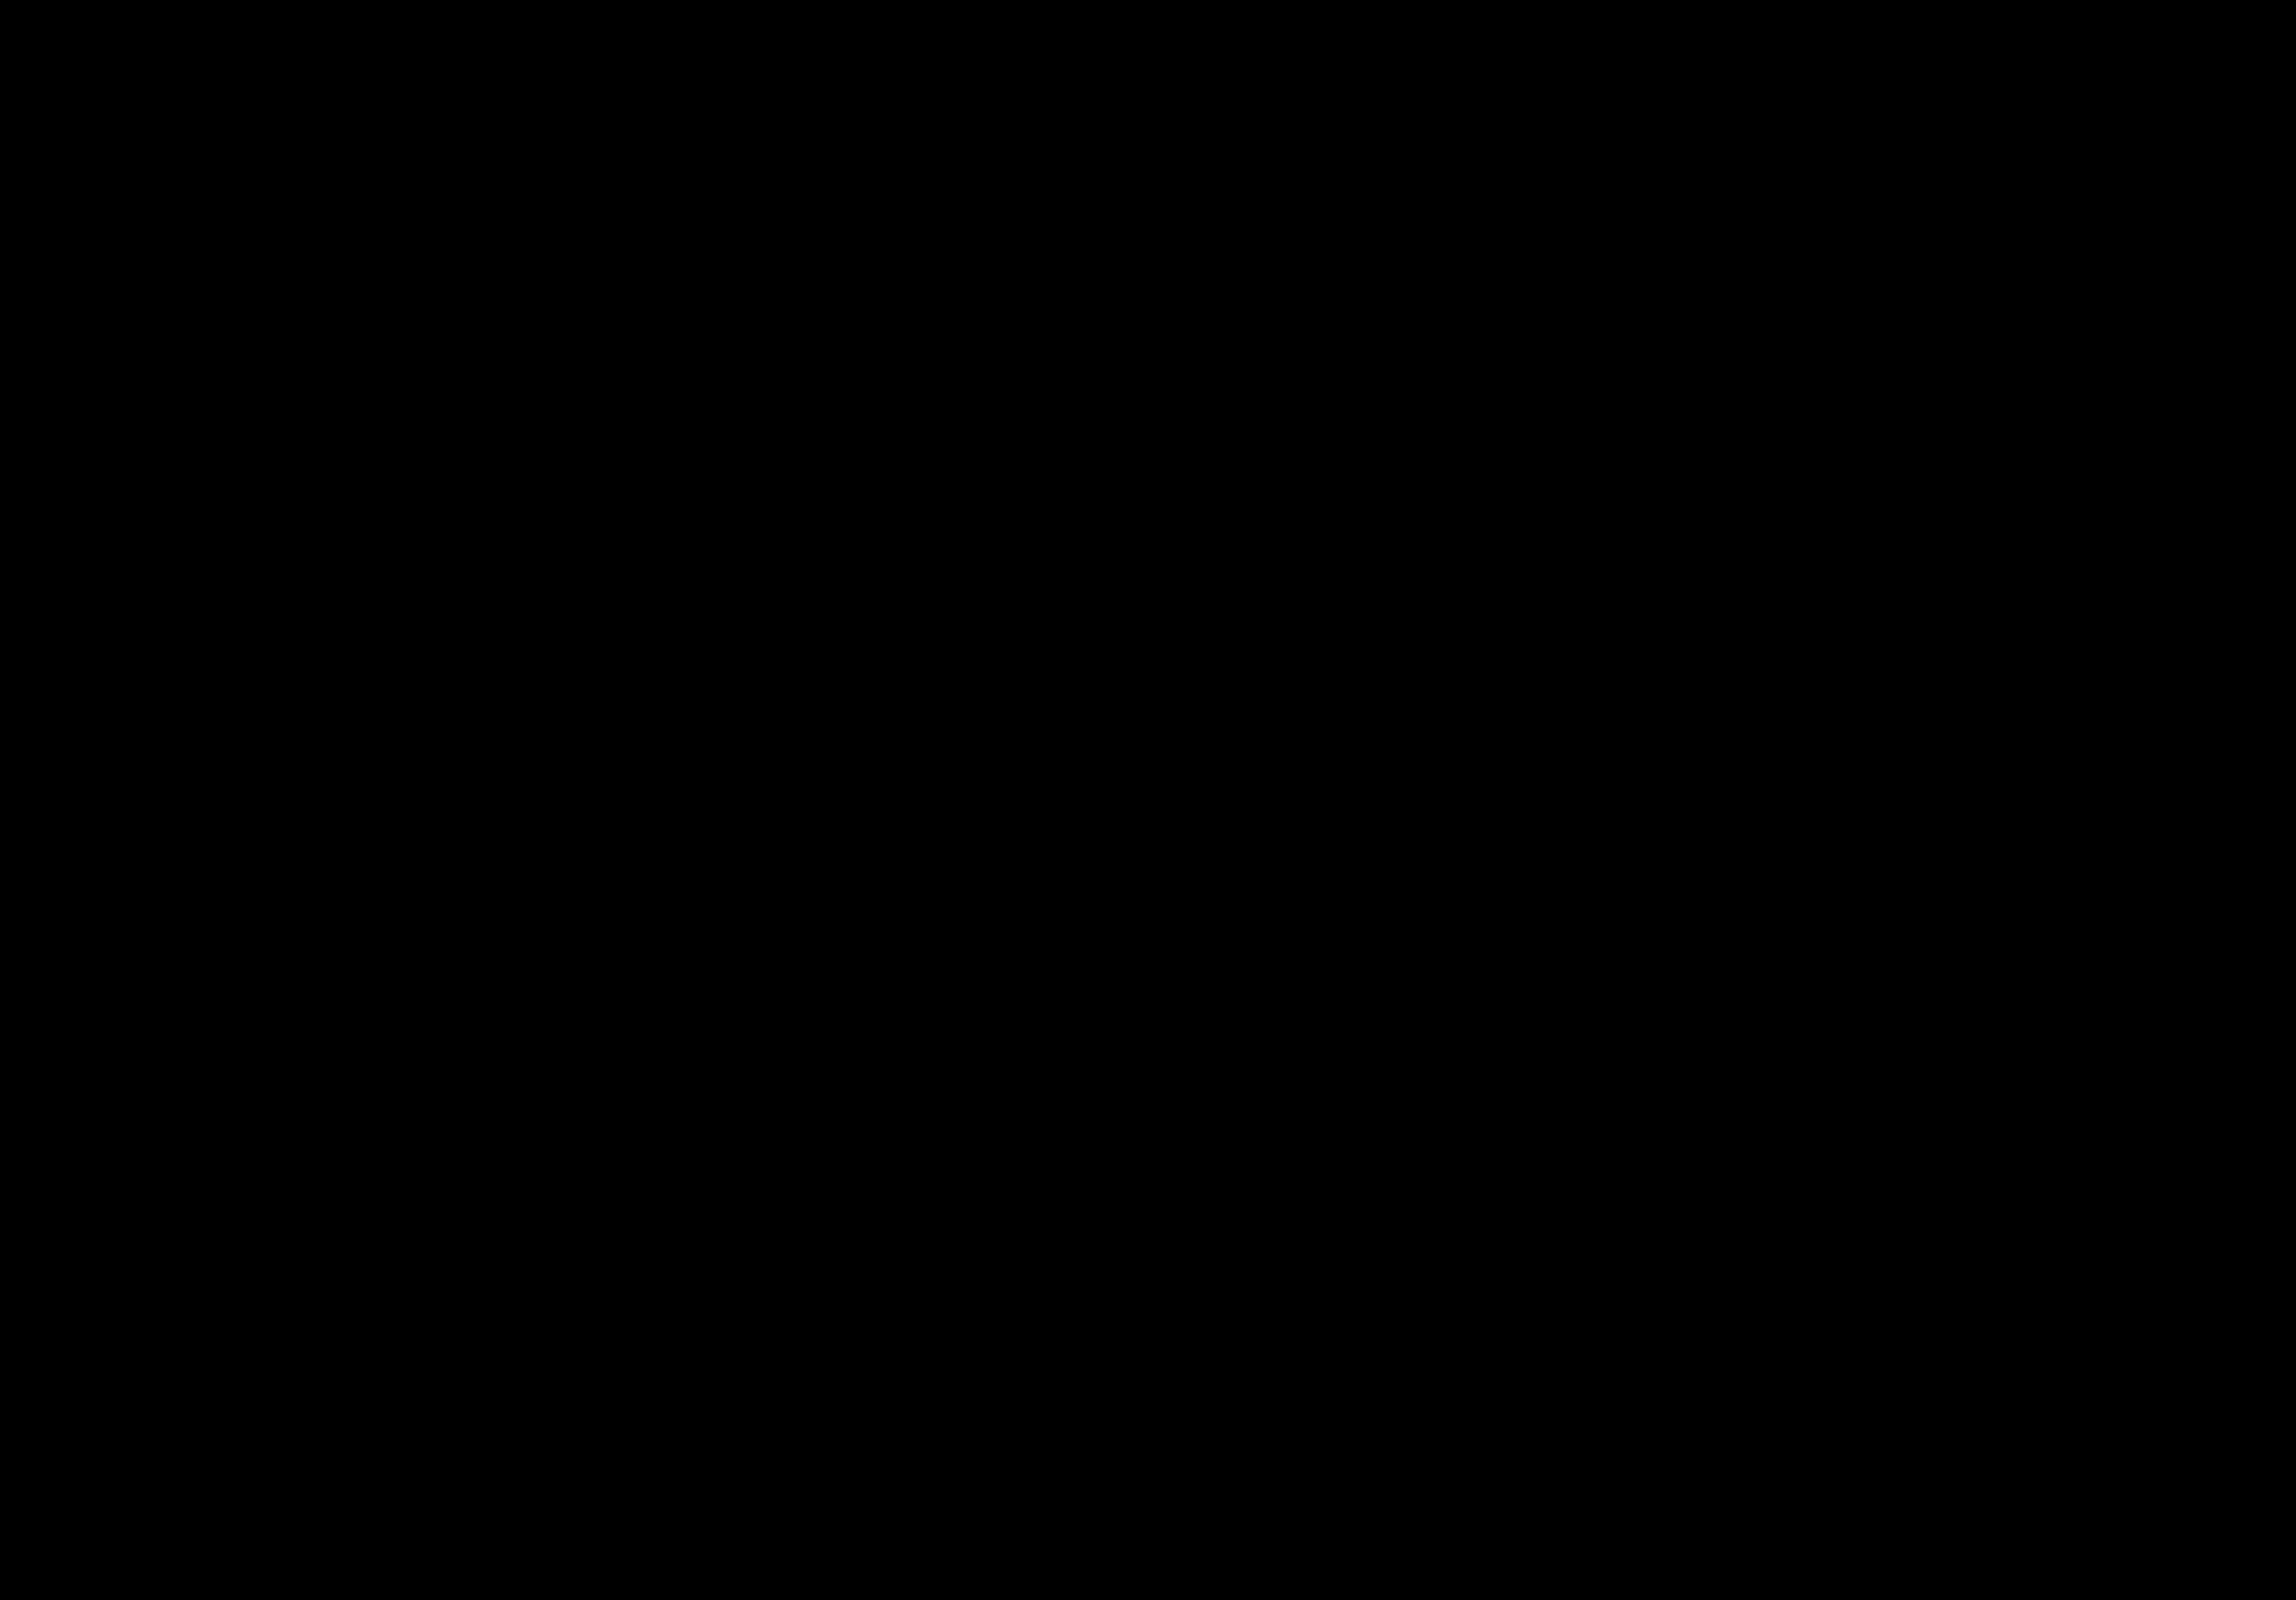 jol_3517-3